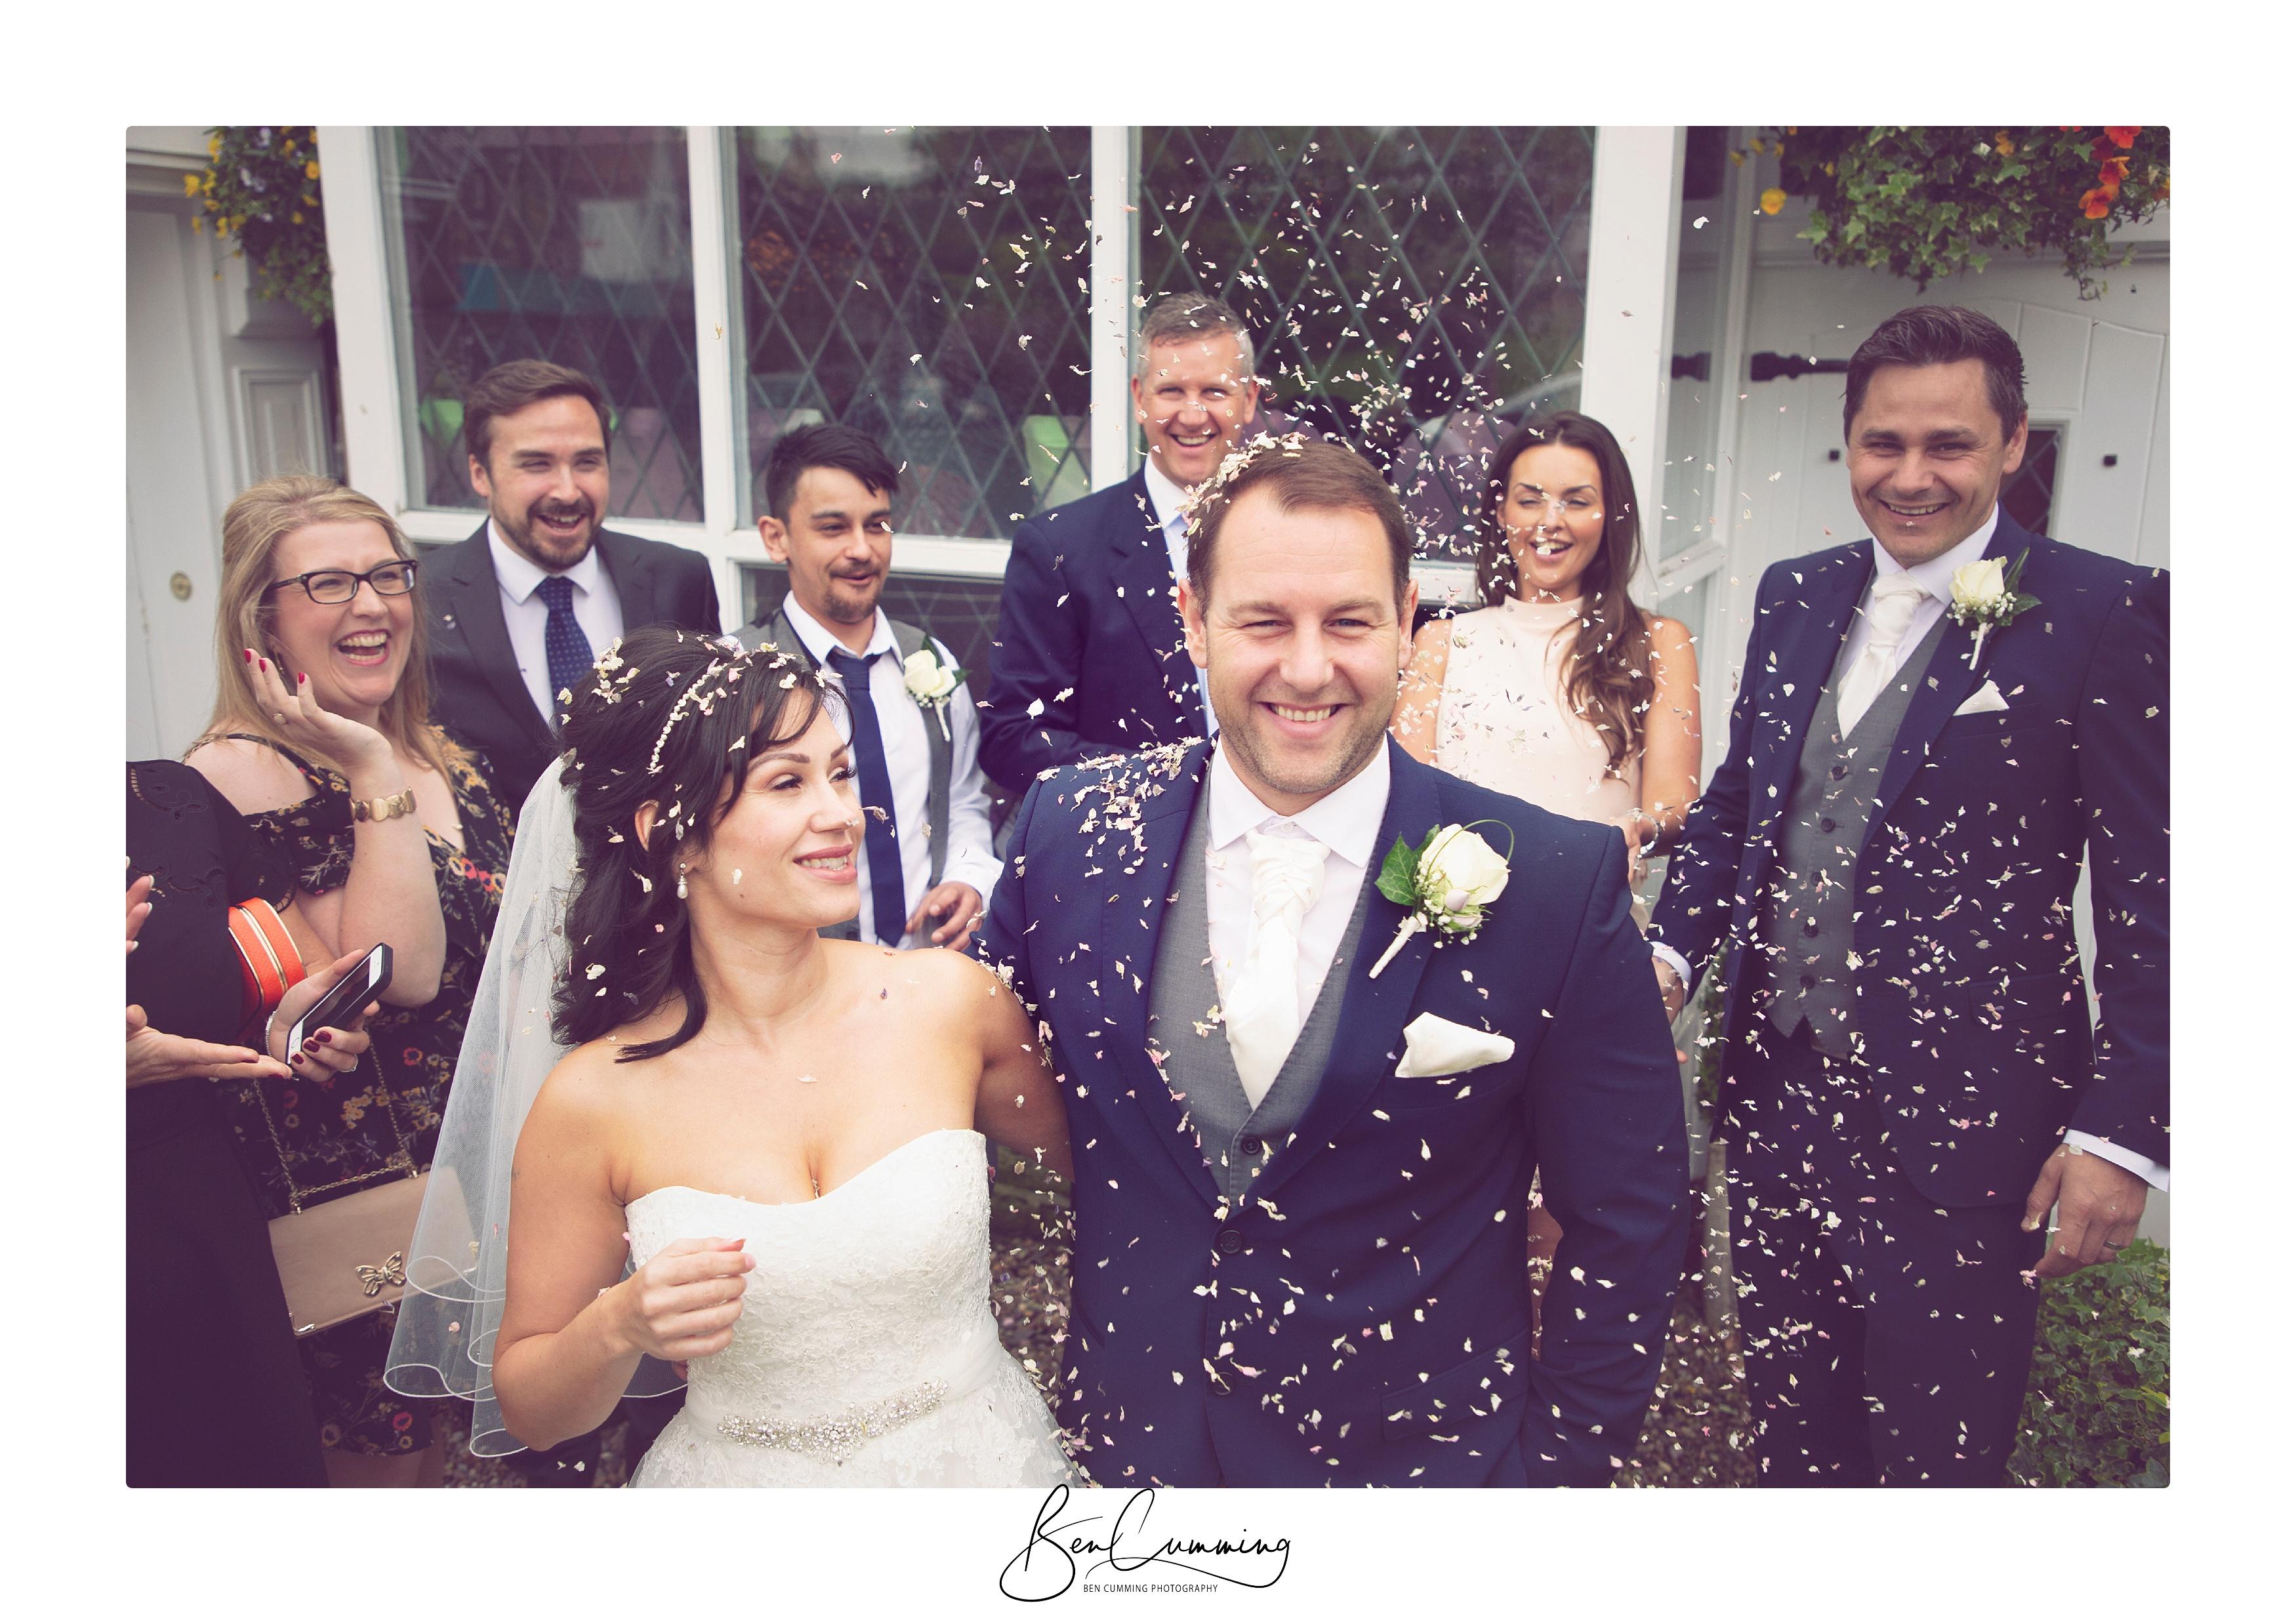 Leeds Wedding Photographer Ben Cumming Wedding Group Shot